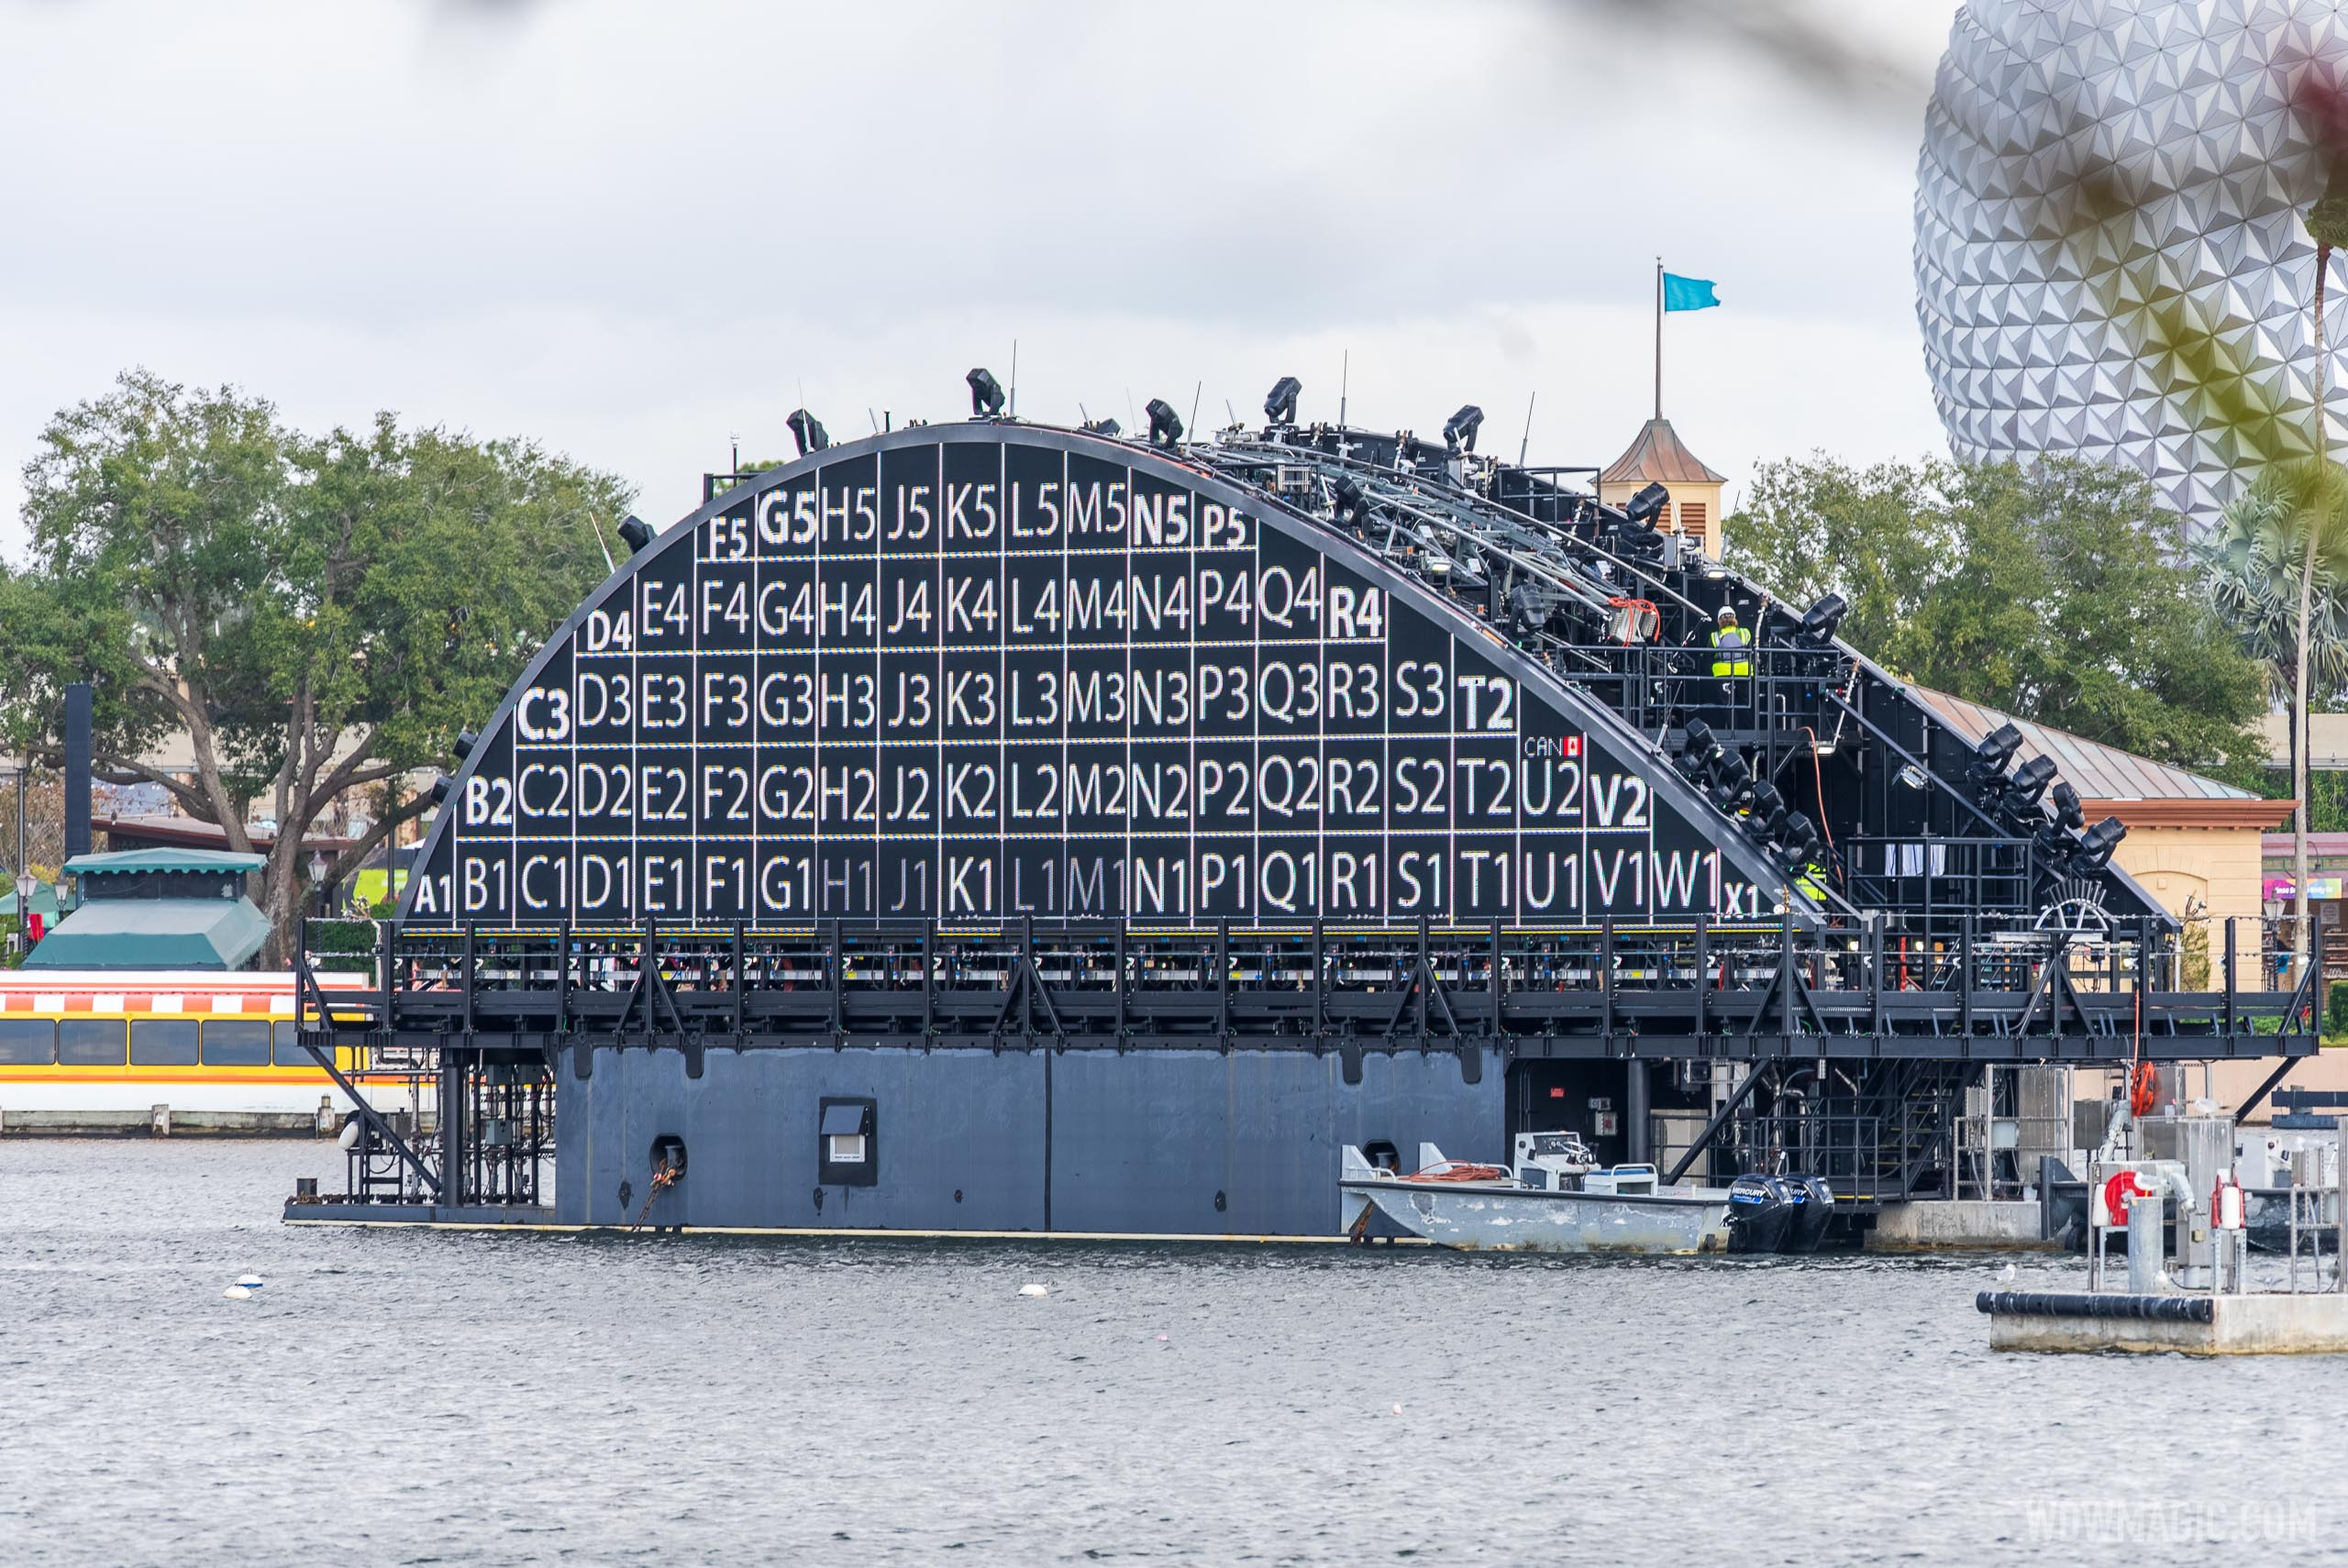 Harmonious barge testing